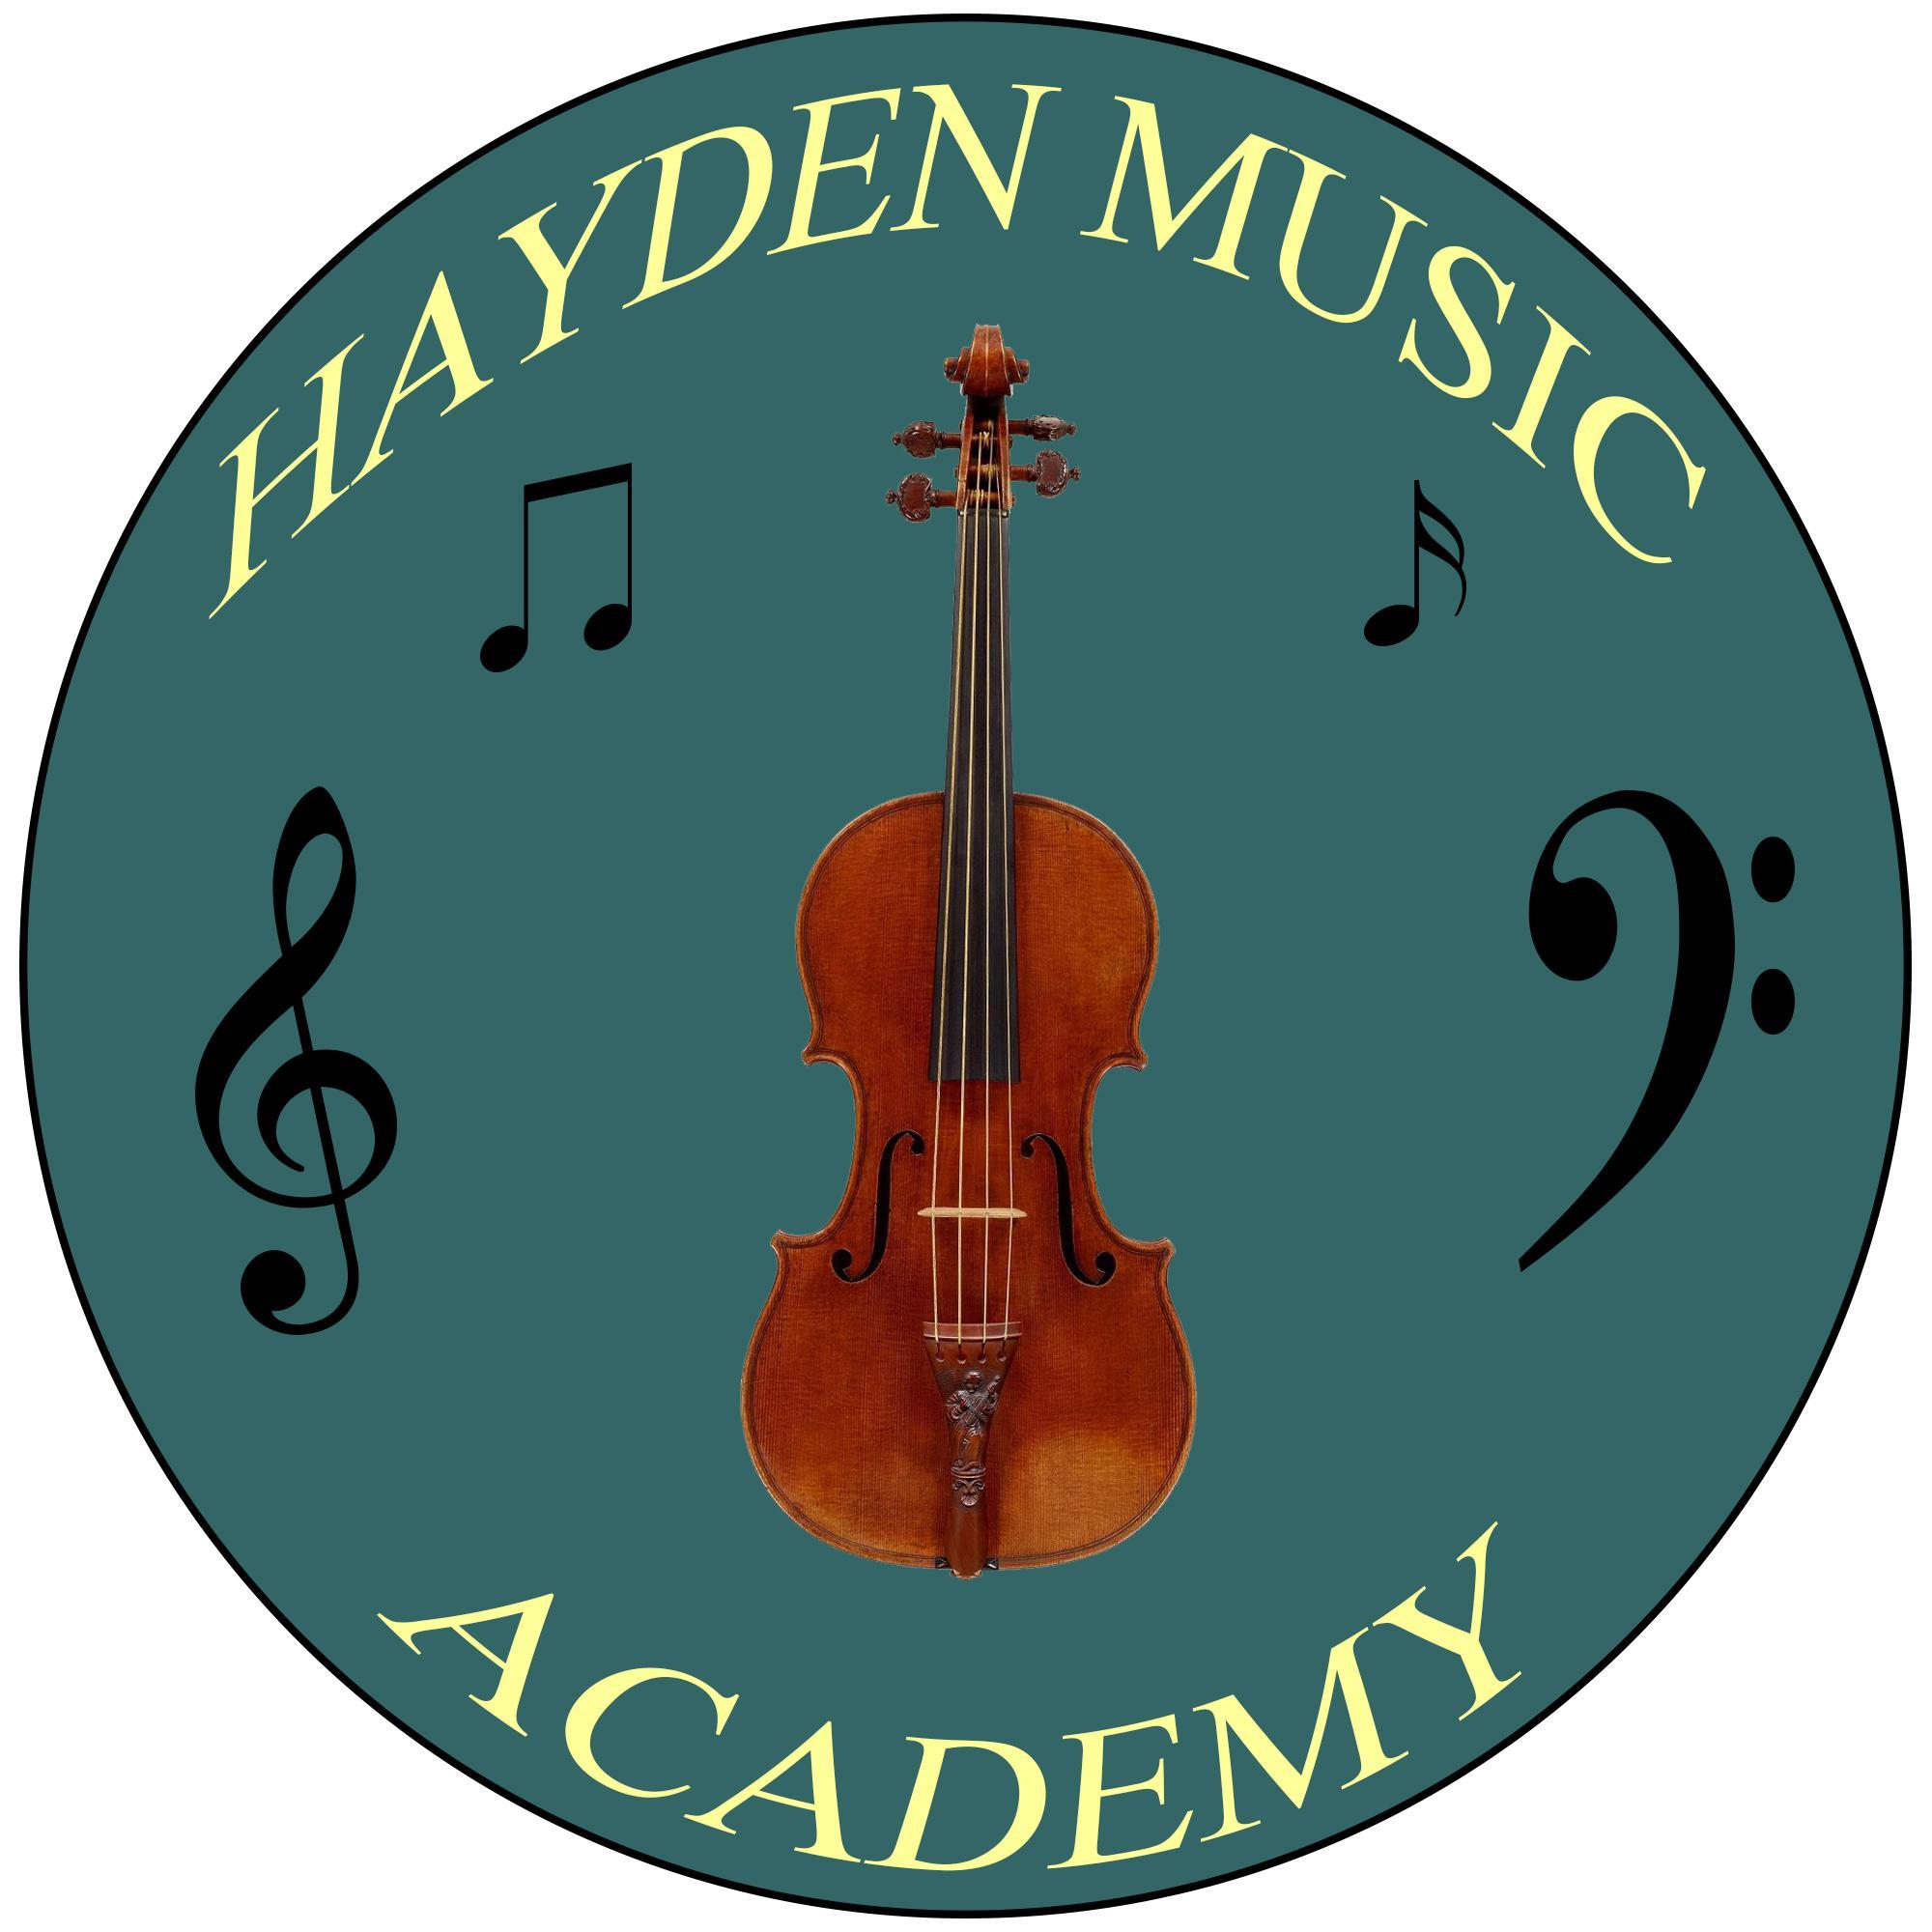 Haydn Music Academy, Haydn Music Academy